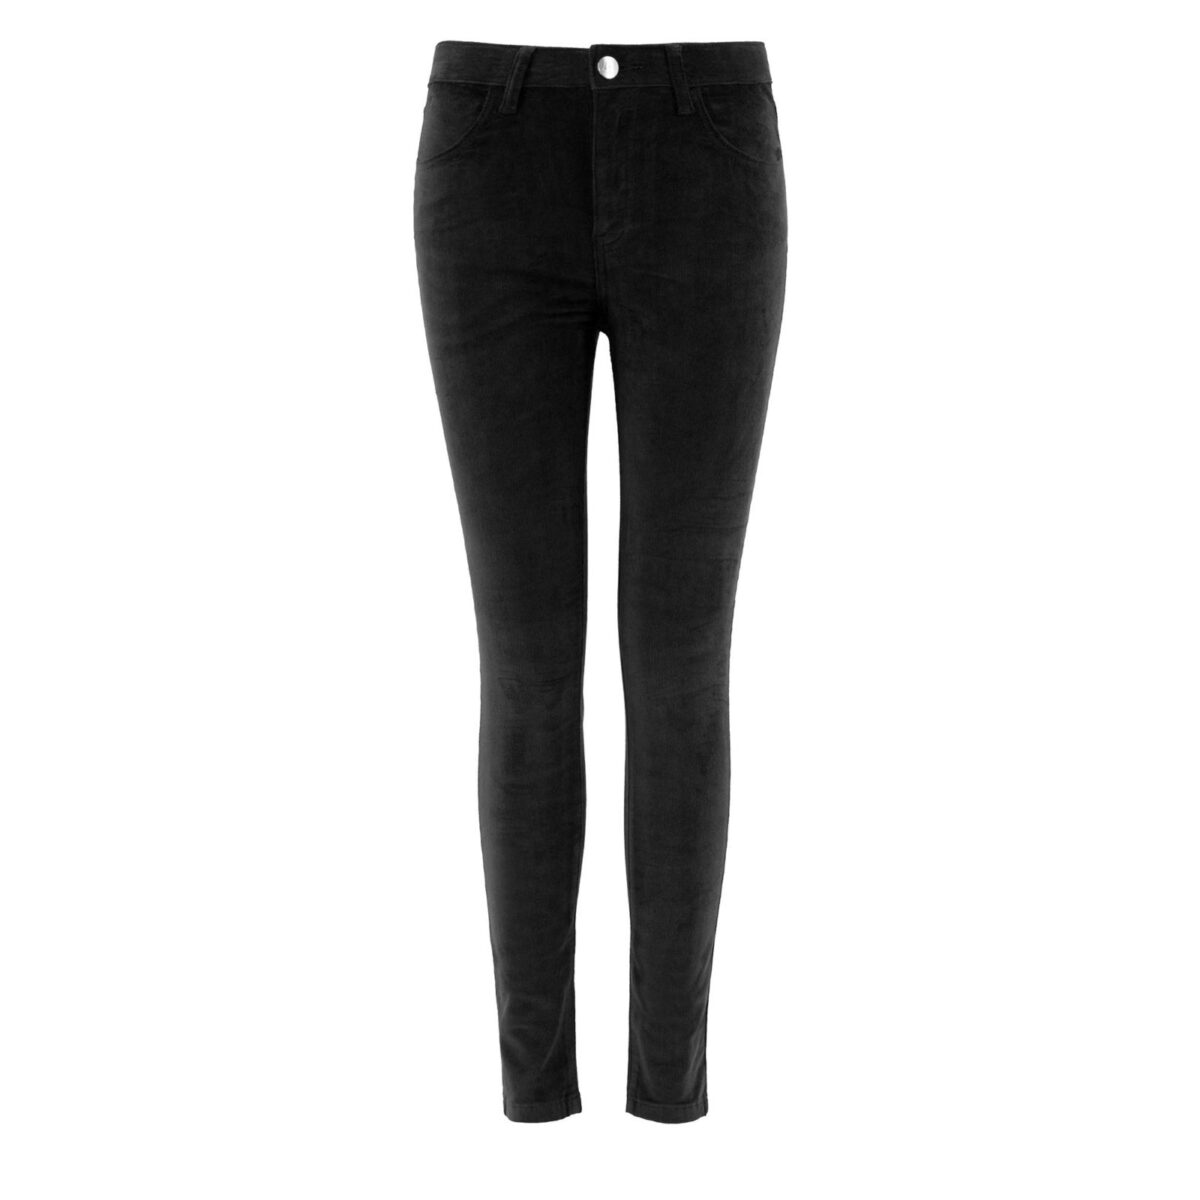 Pantalone Skinny in velluto a costine NERO - vista frontale | Nicla